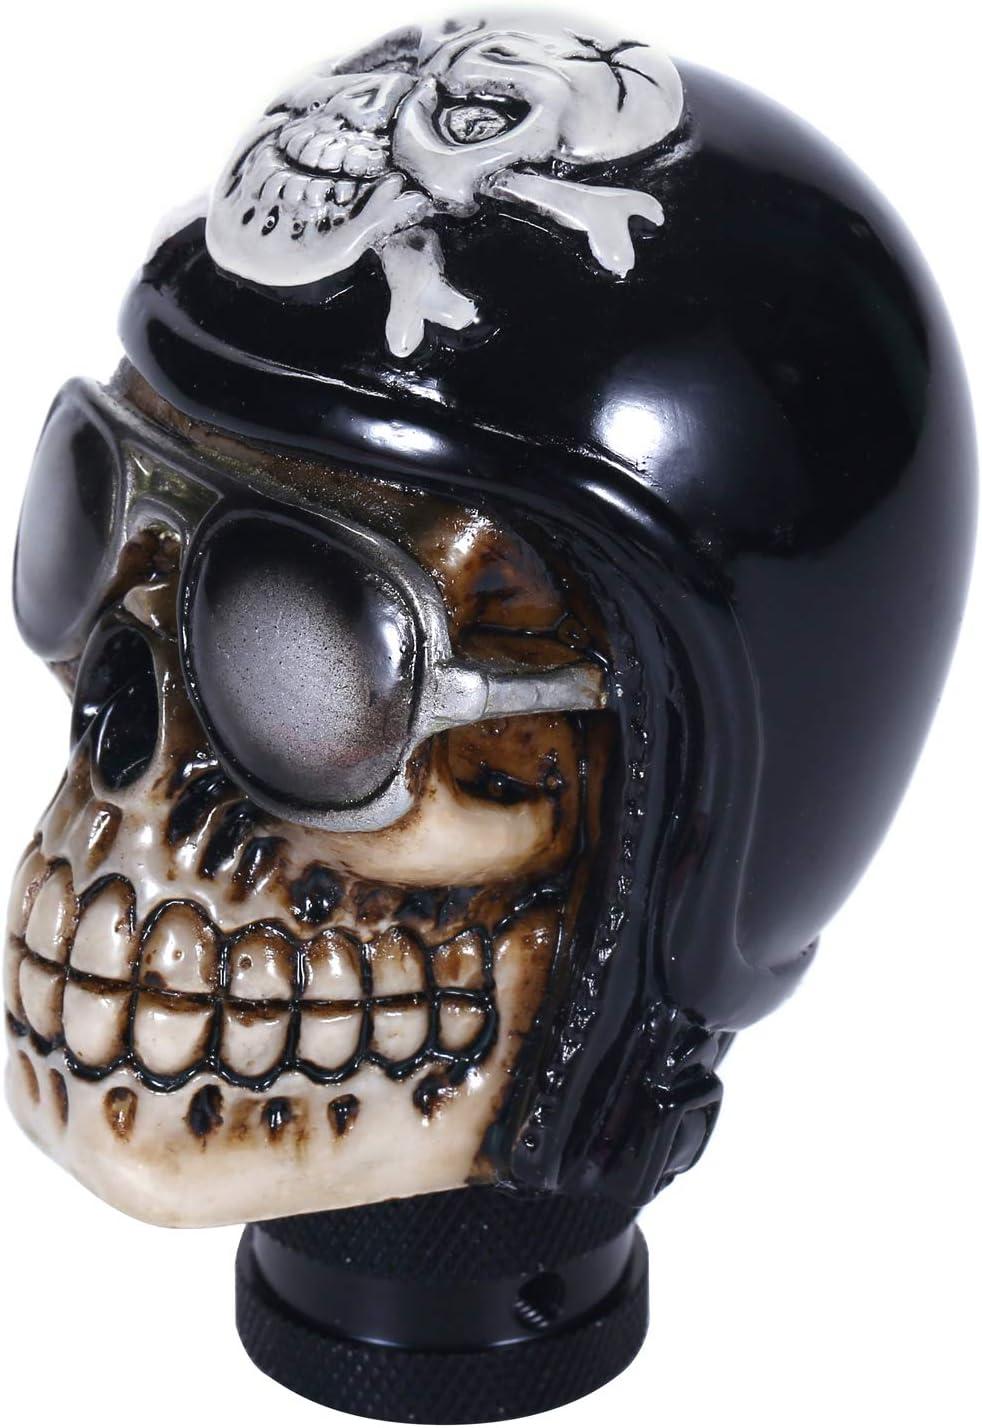 Bashineng Pirate Stick Shifter Knob Skull Shape Universal Gear Shift Head Fit Most Manual Cars Black